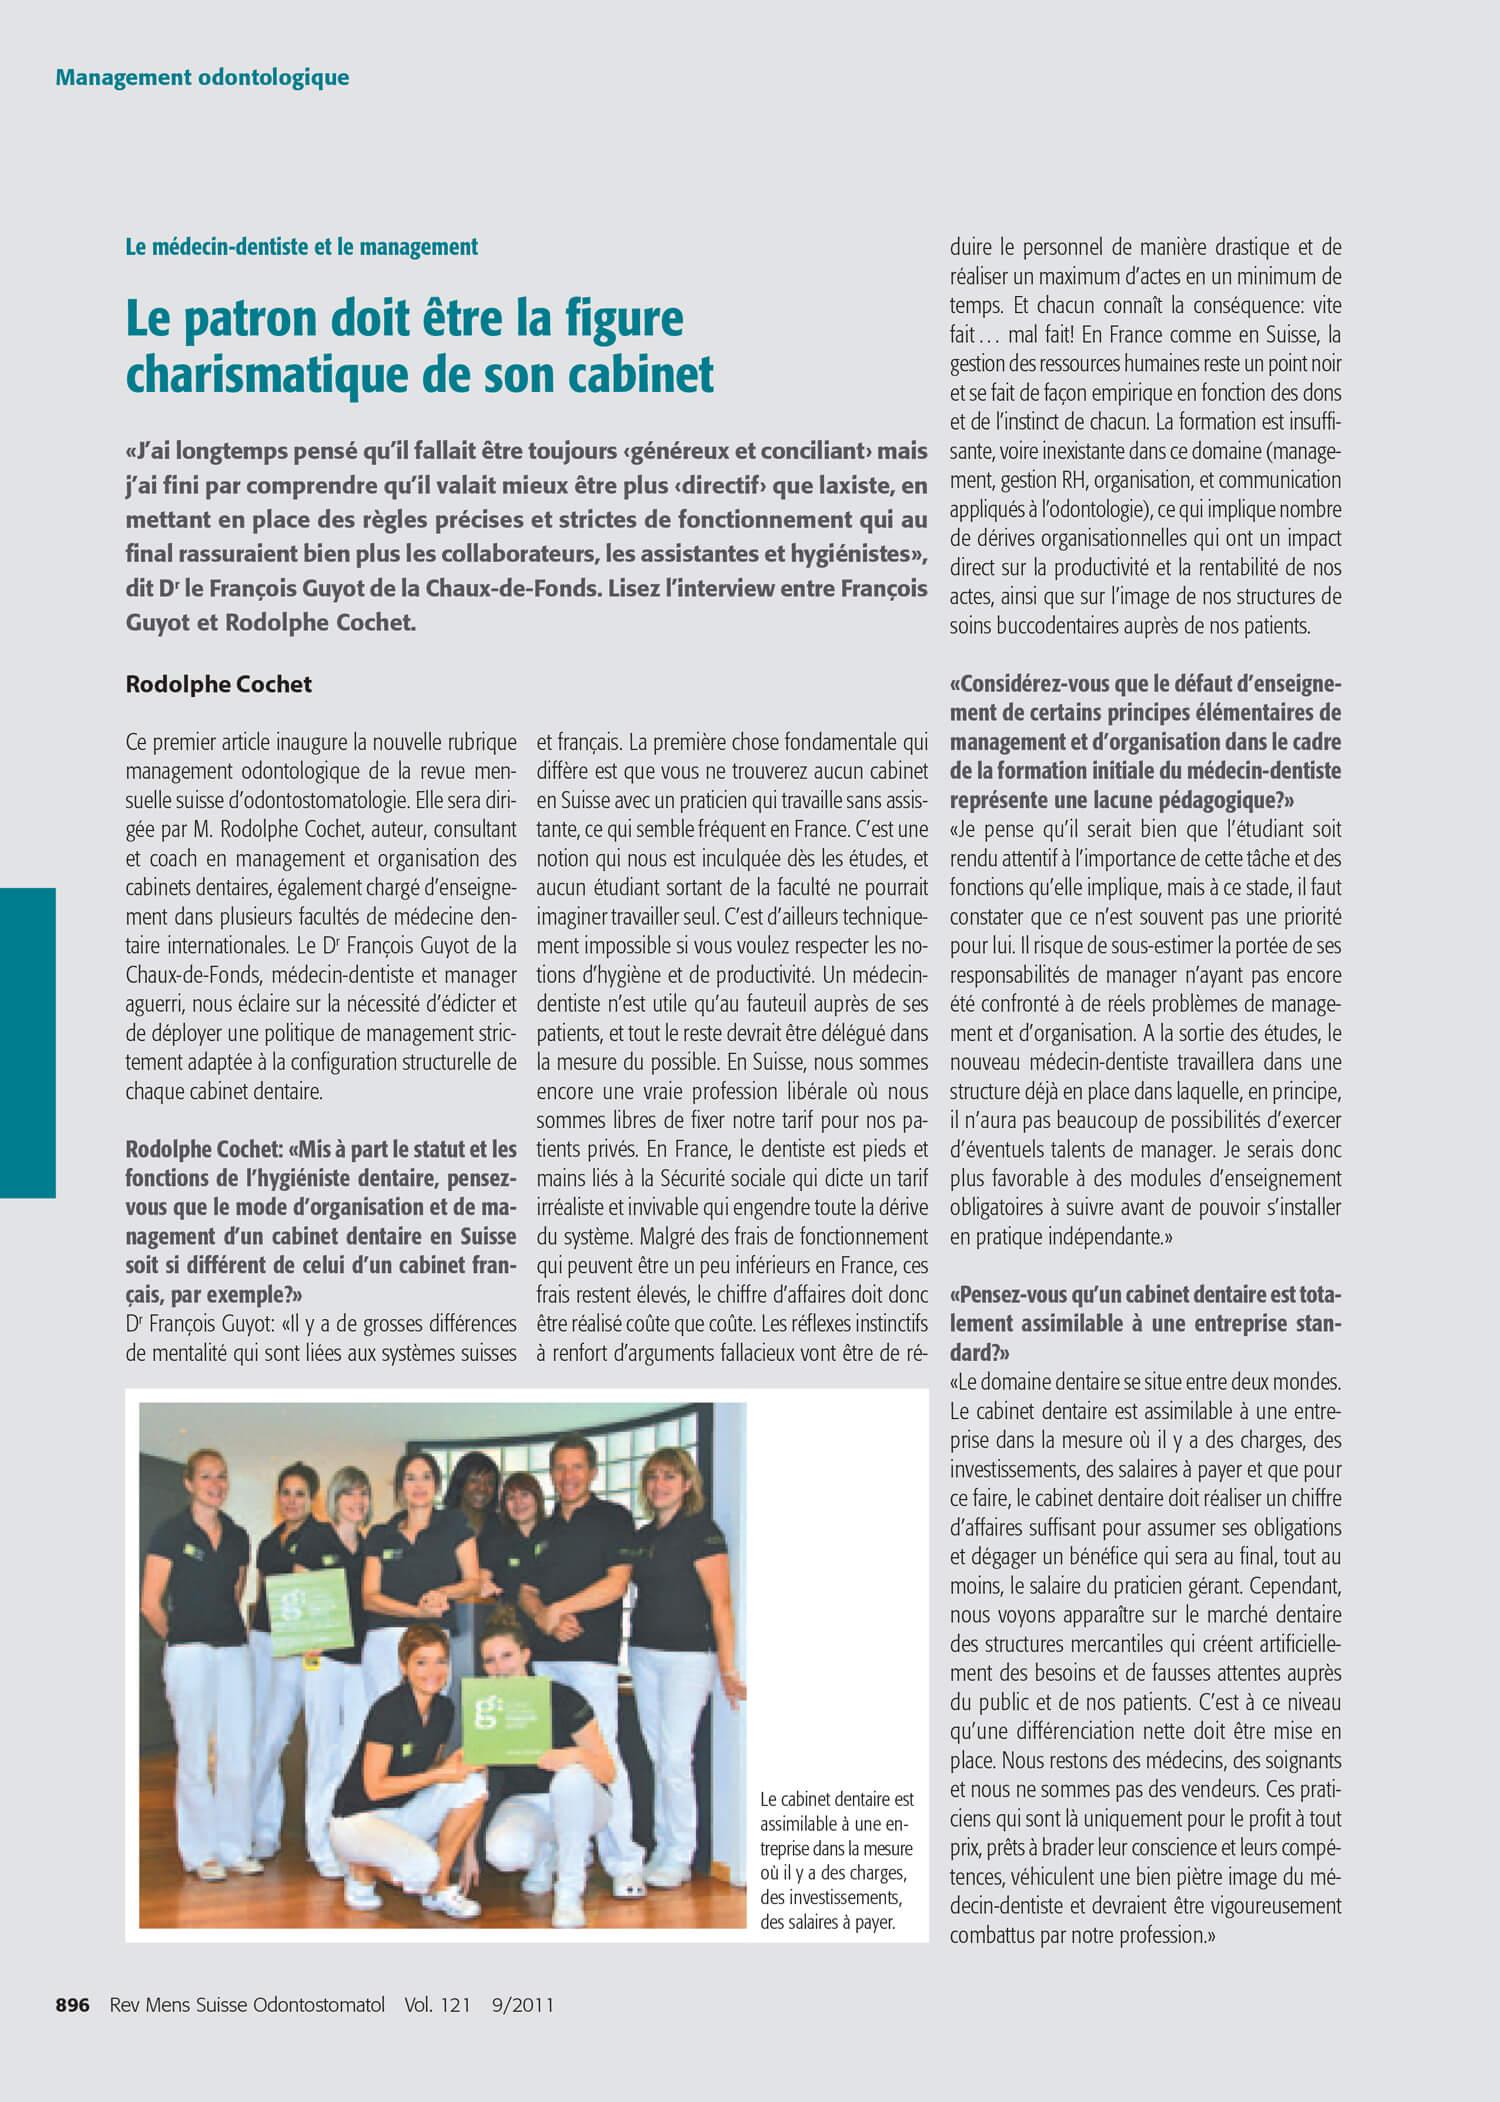 Revue-Mensuelle-Suisse-dentaire-rodolphe-cochet-management-conference-sso.jpg